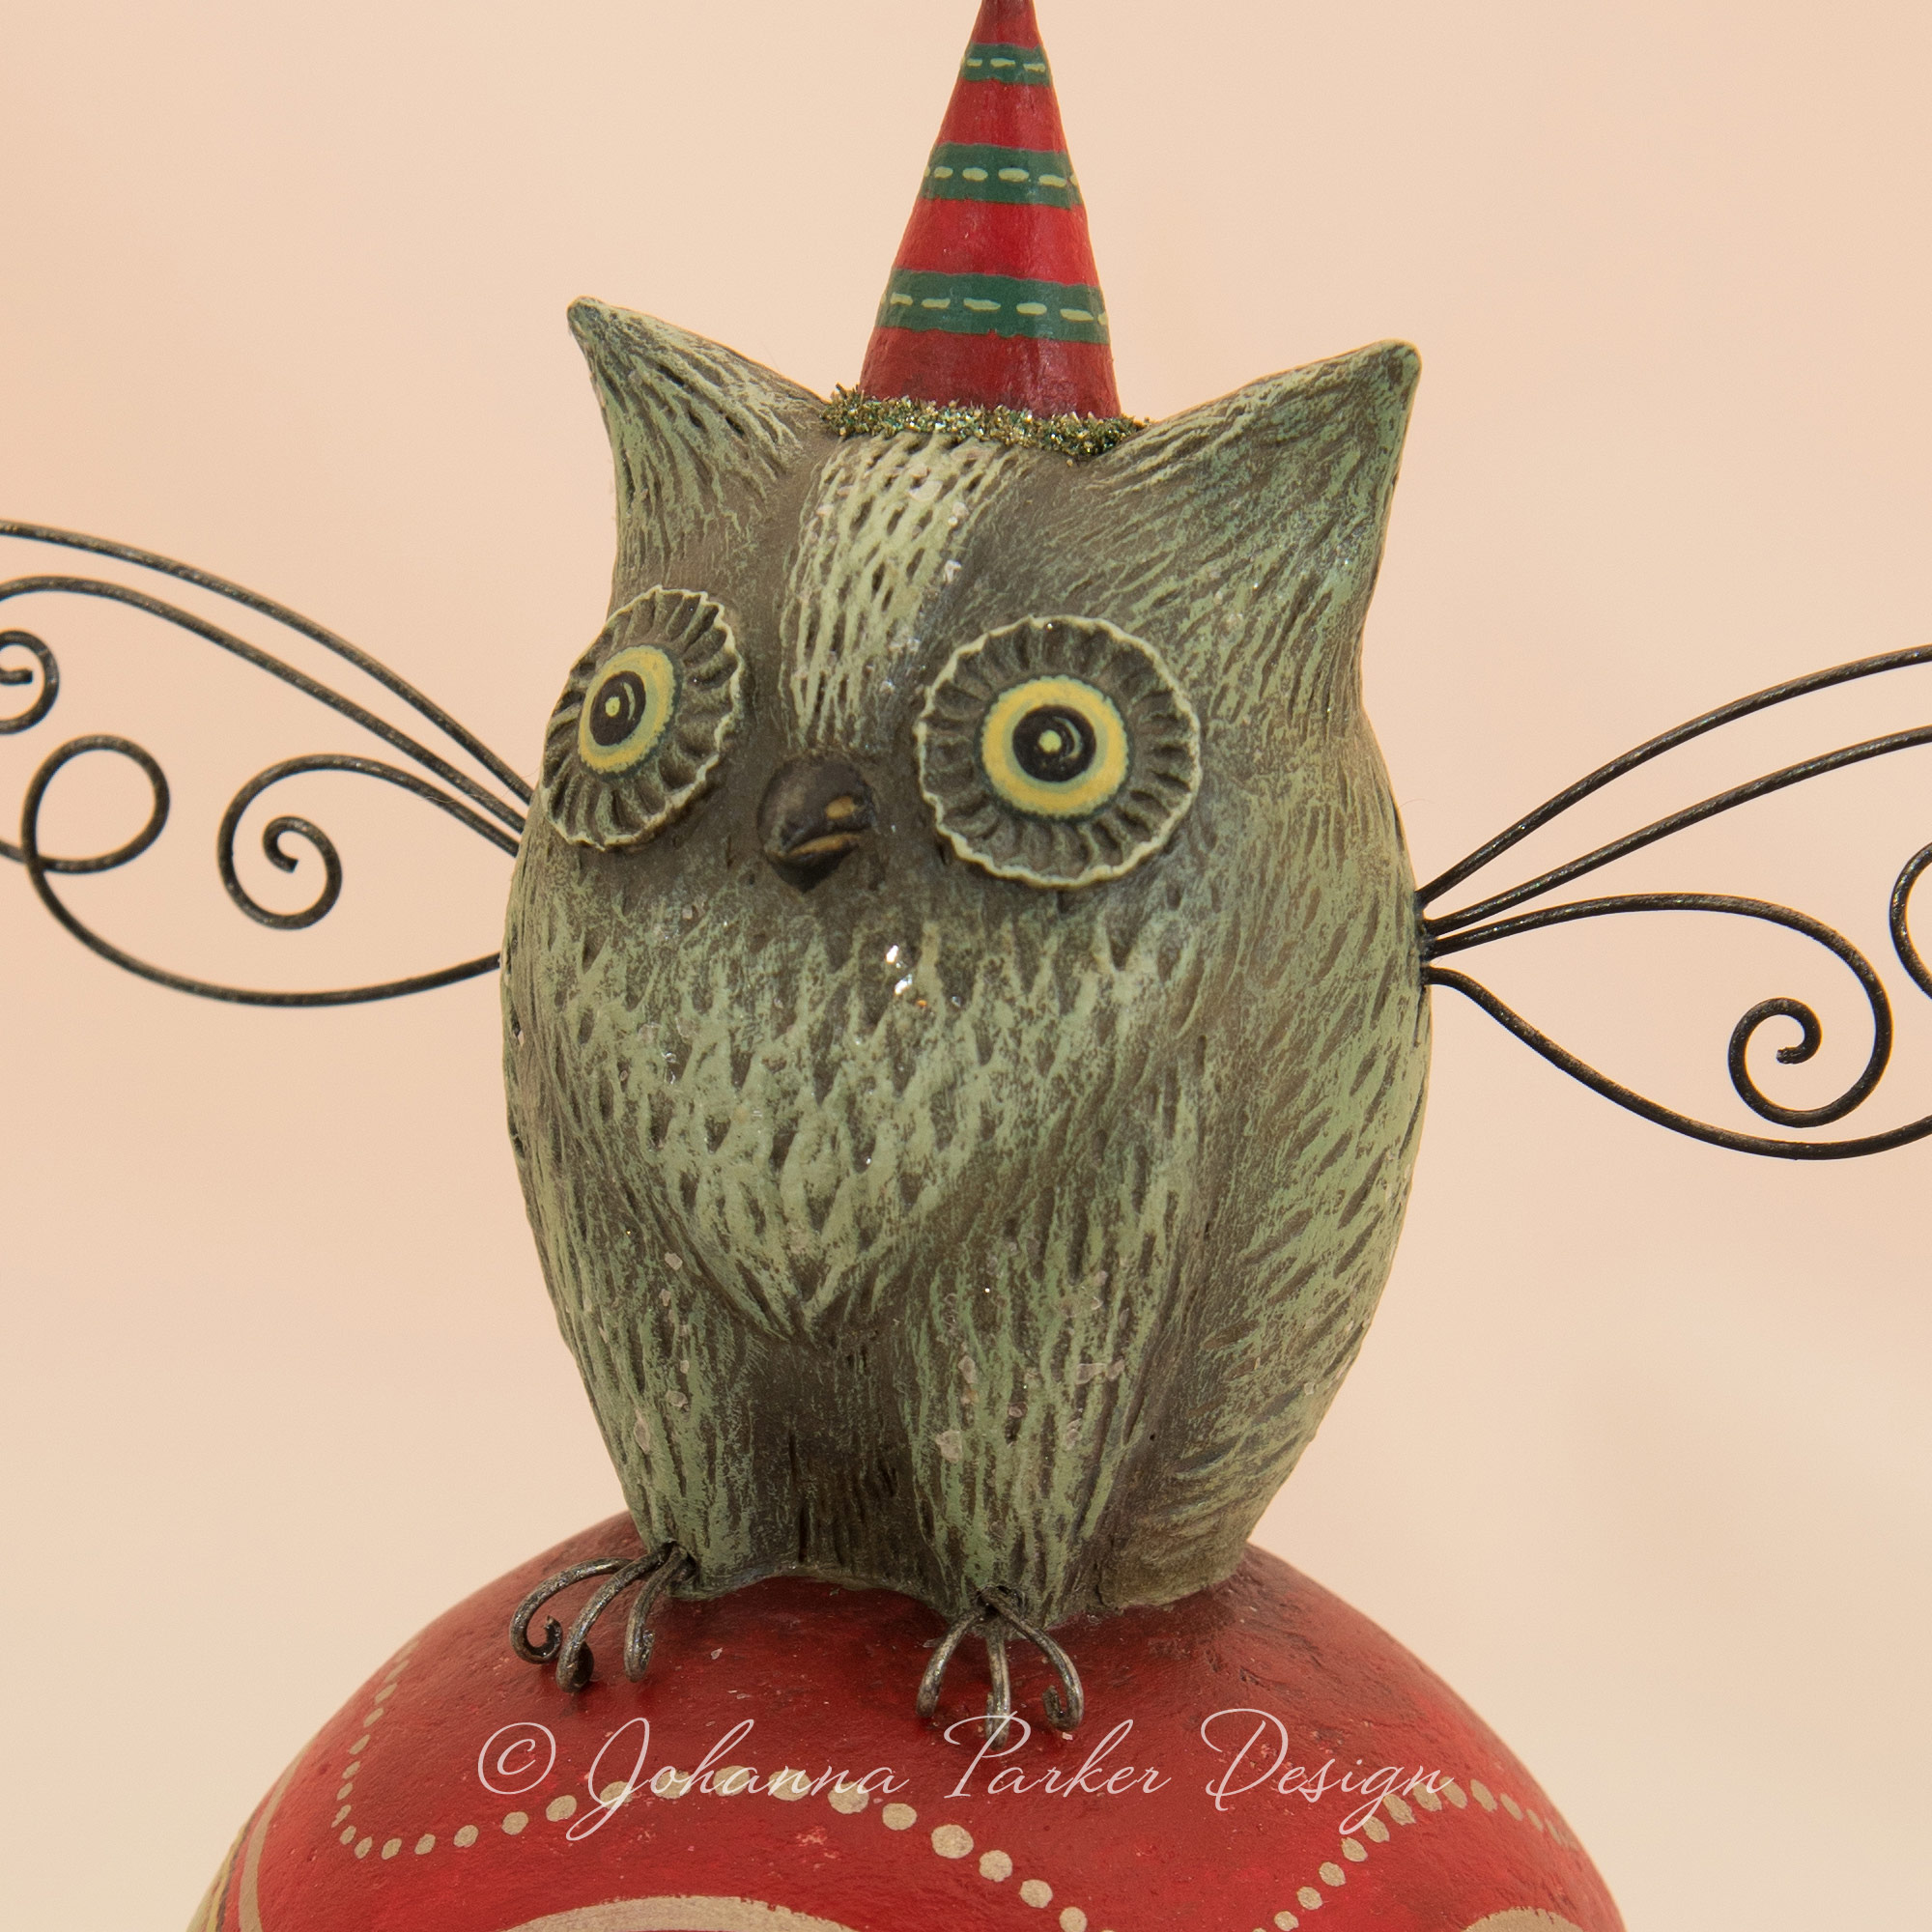 Johanna-Parker-Evergreen-Owliver-6.jpg